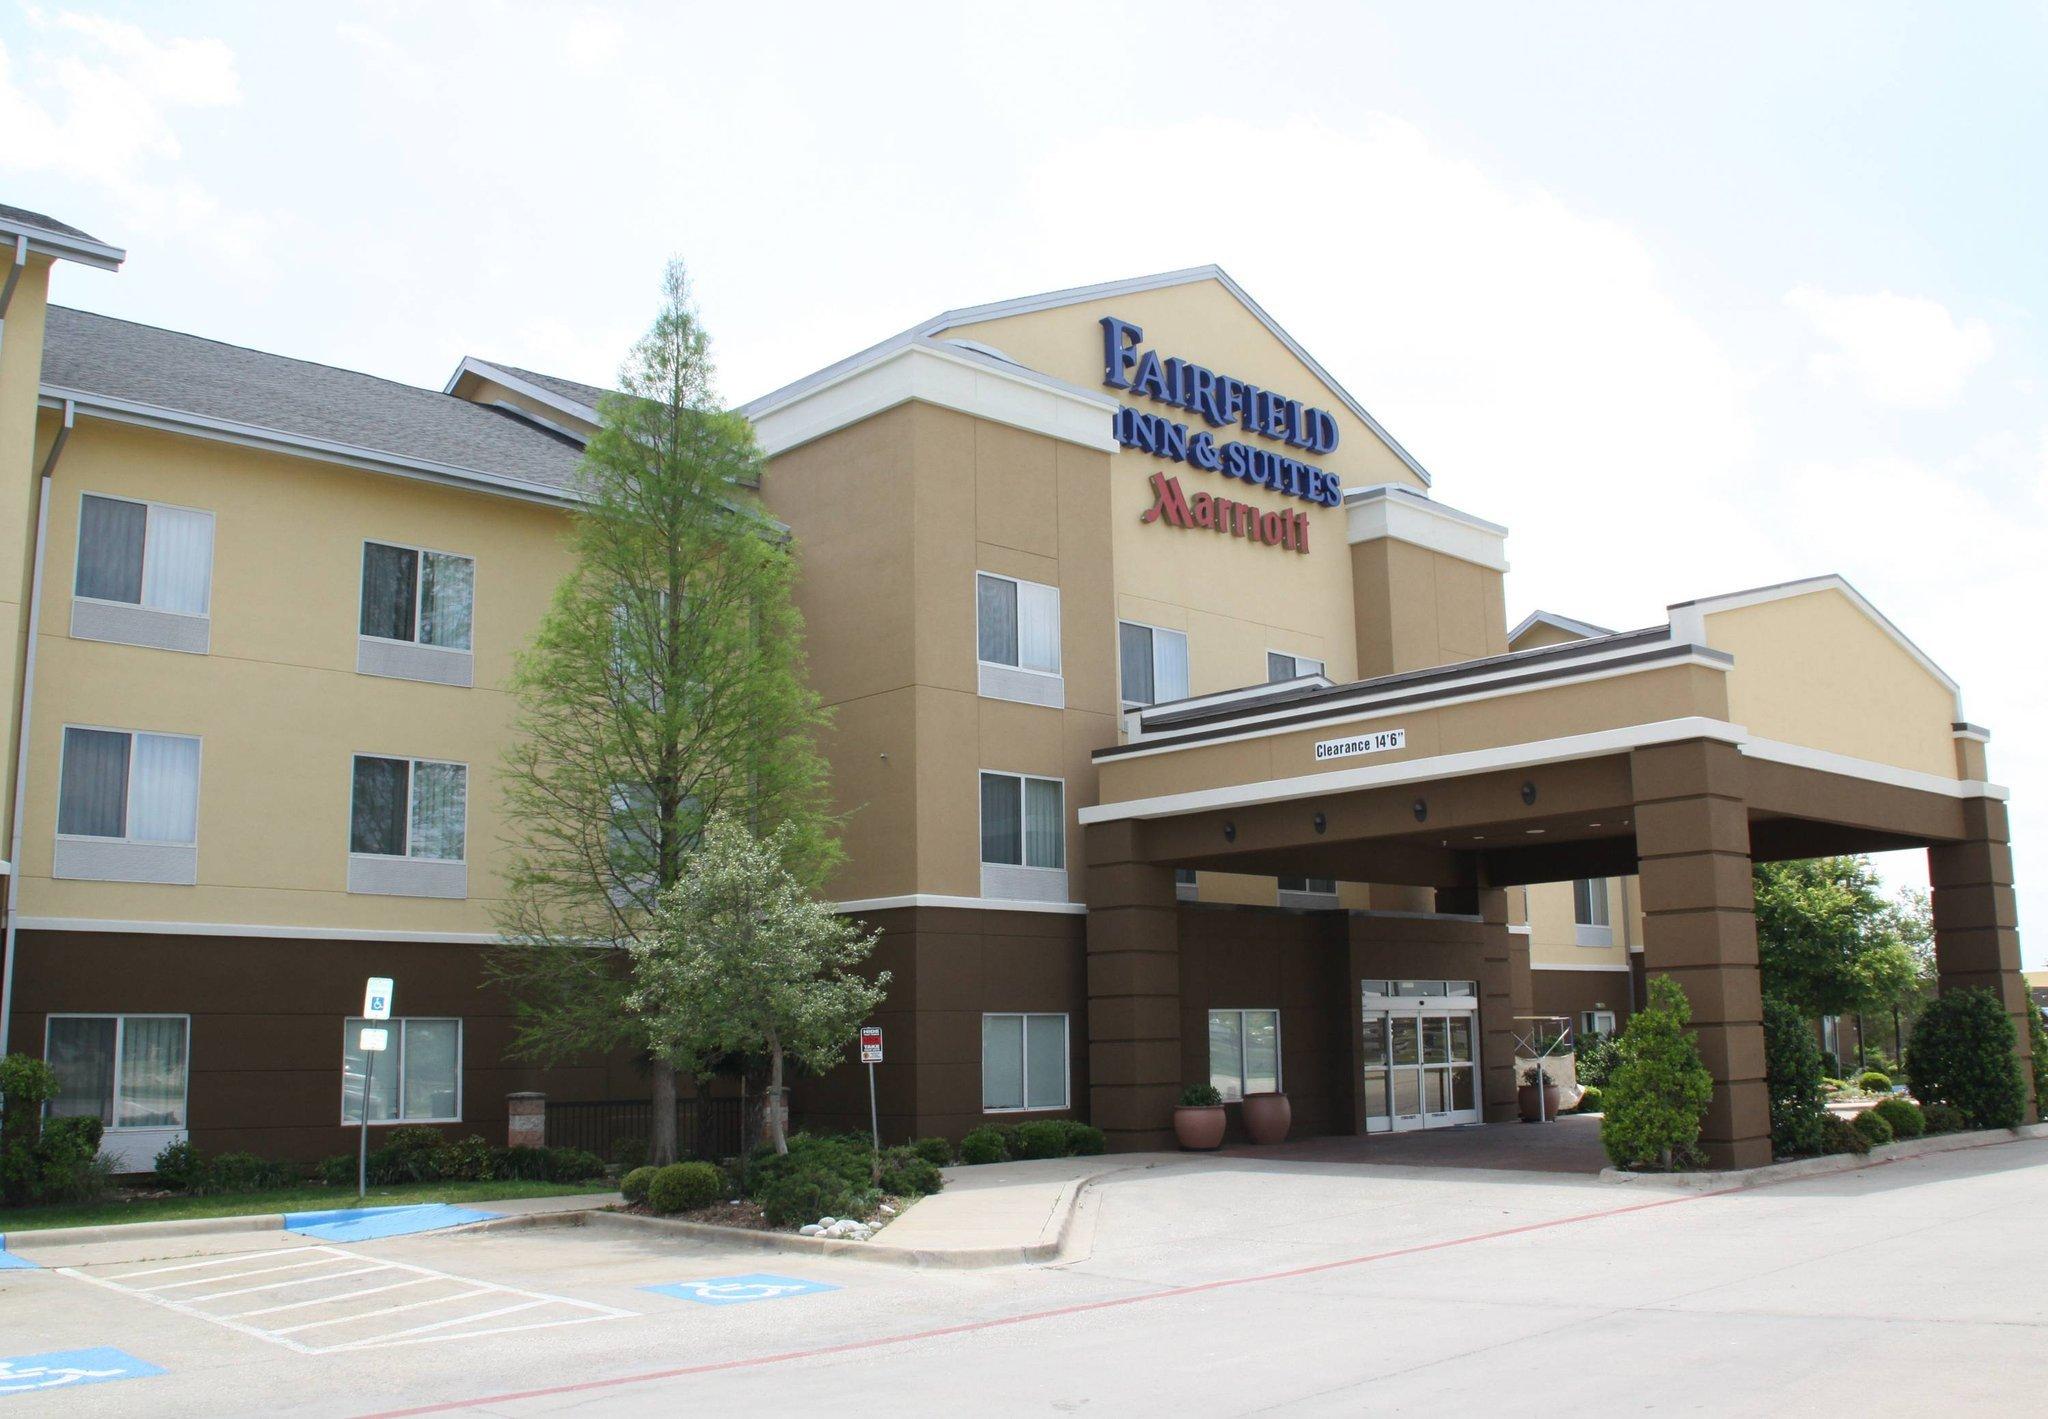 Fairfield Inn & Suites Denton